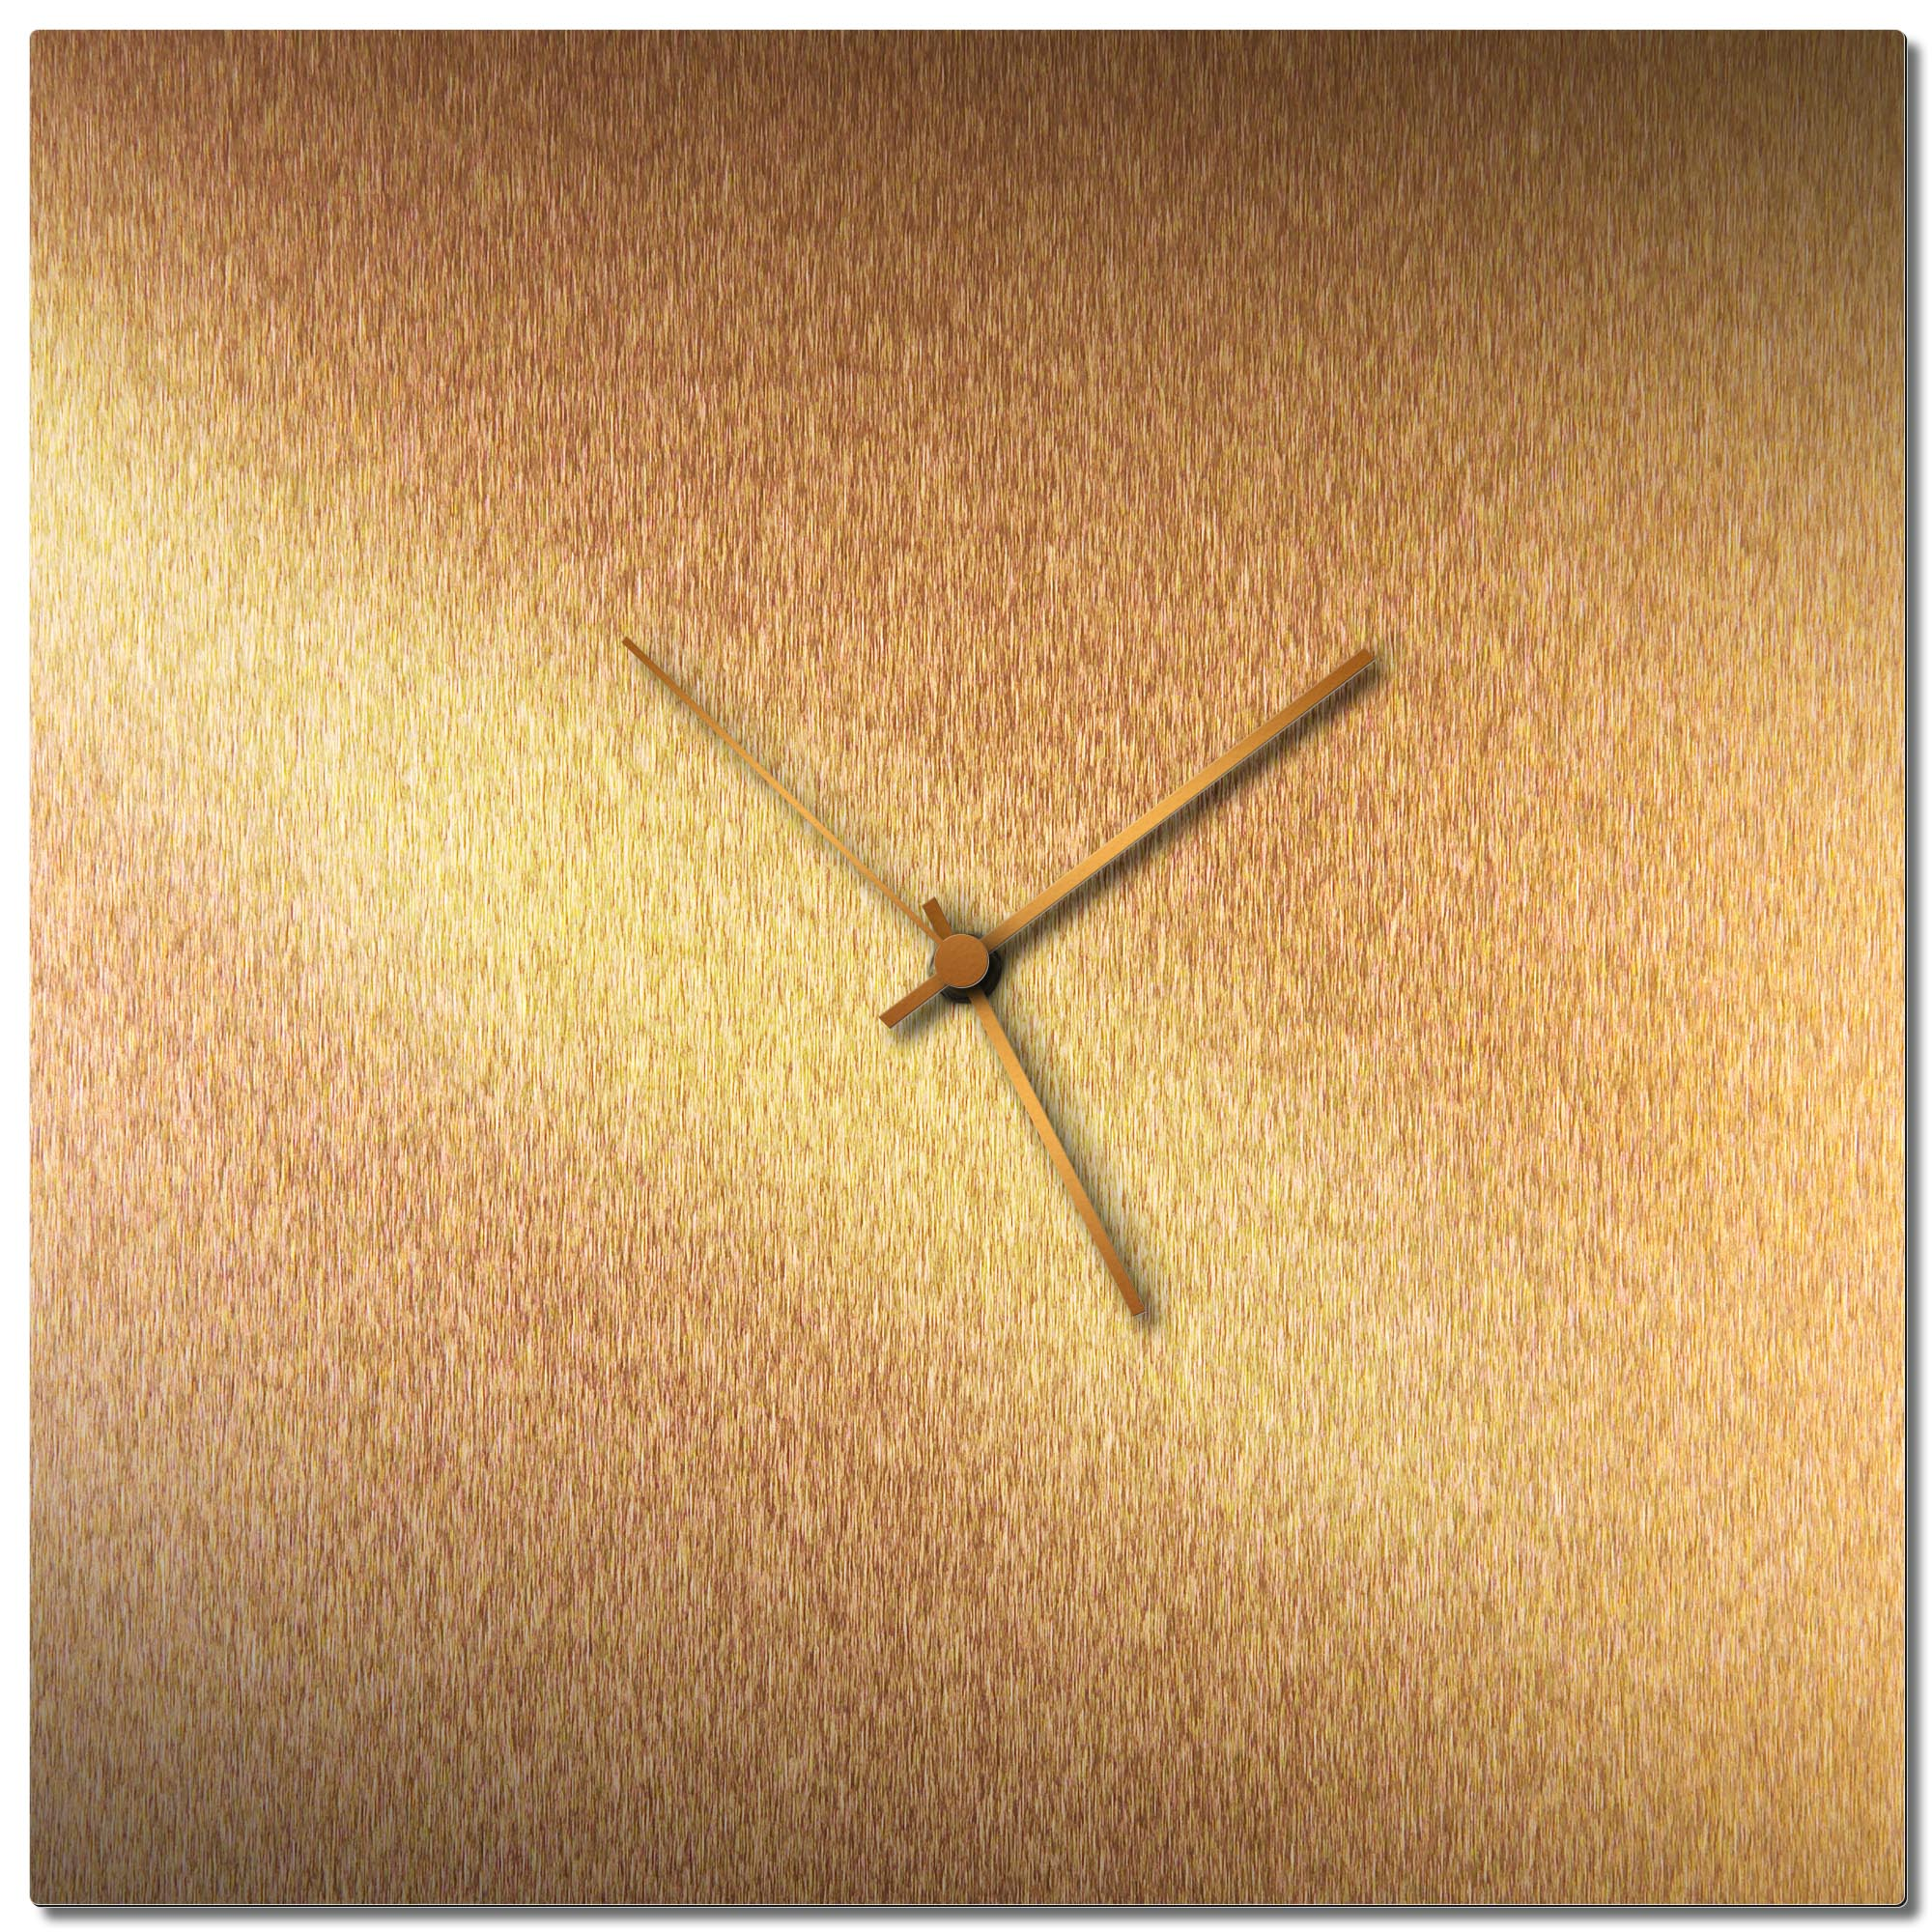 Adam Schwoeppe 'Bronzesmith Square Clock Bronze' Midcentury Modern Style Wall Clock